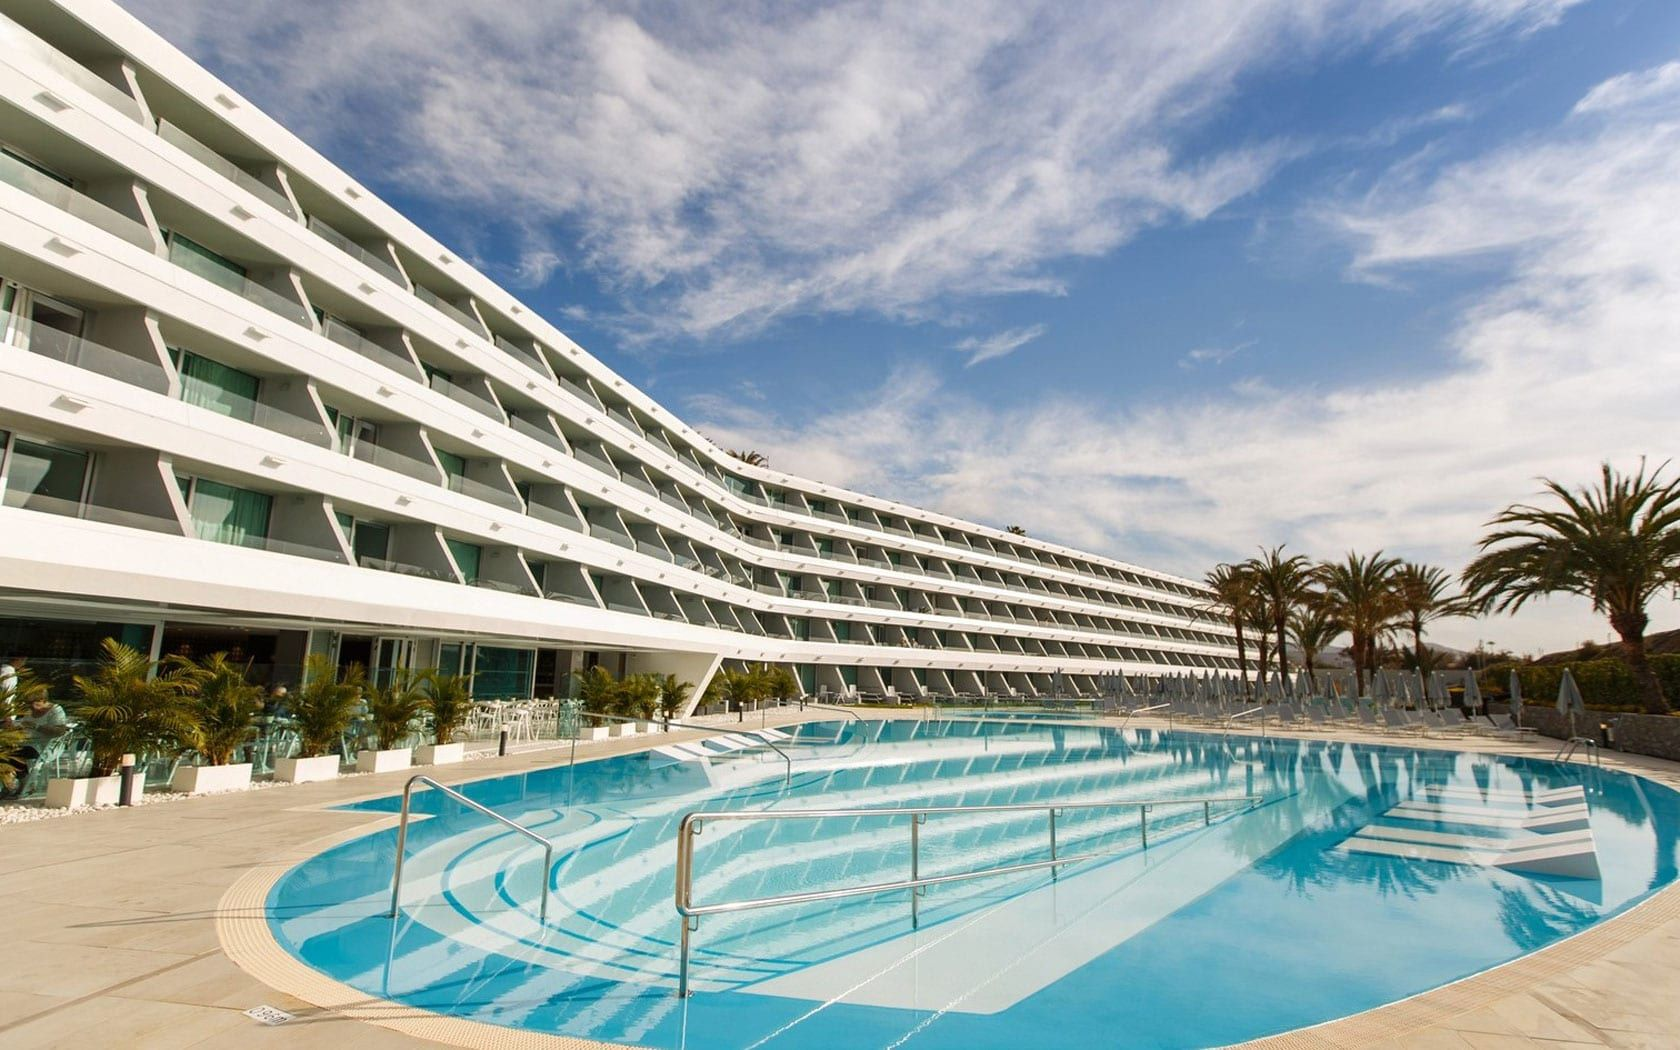 Santa Mónica Suites Hotel   Playa del ingles, Best hotel